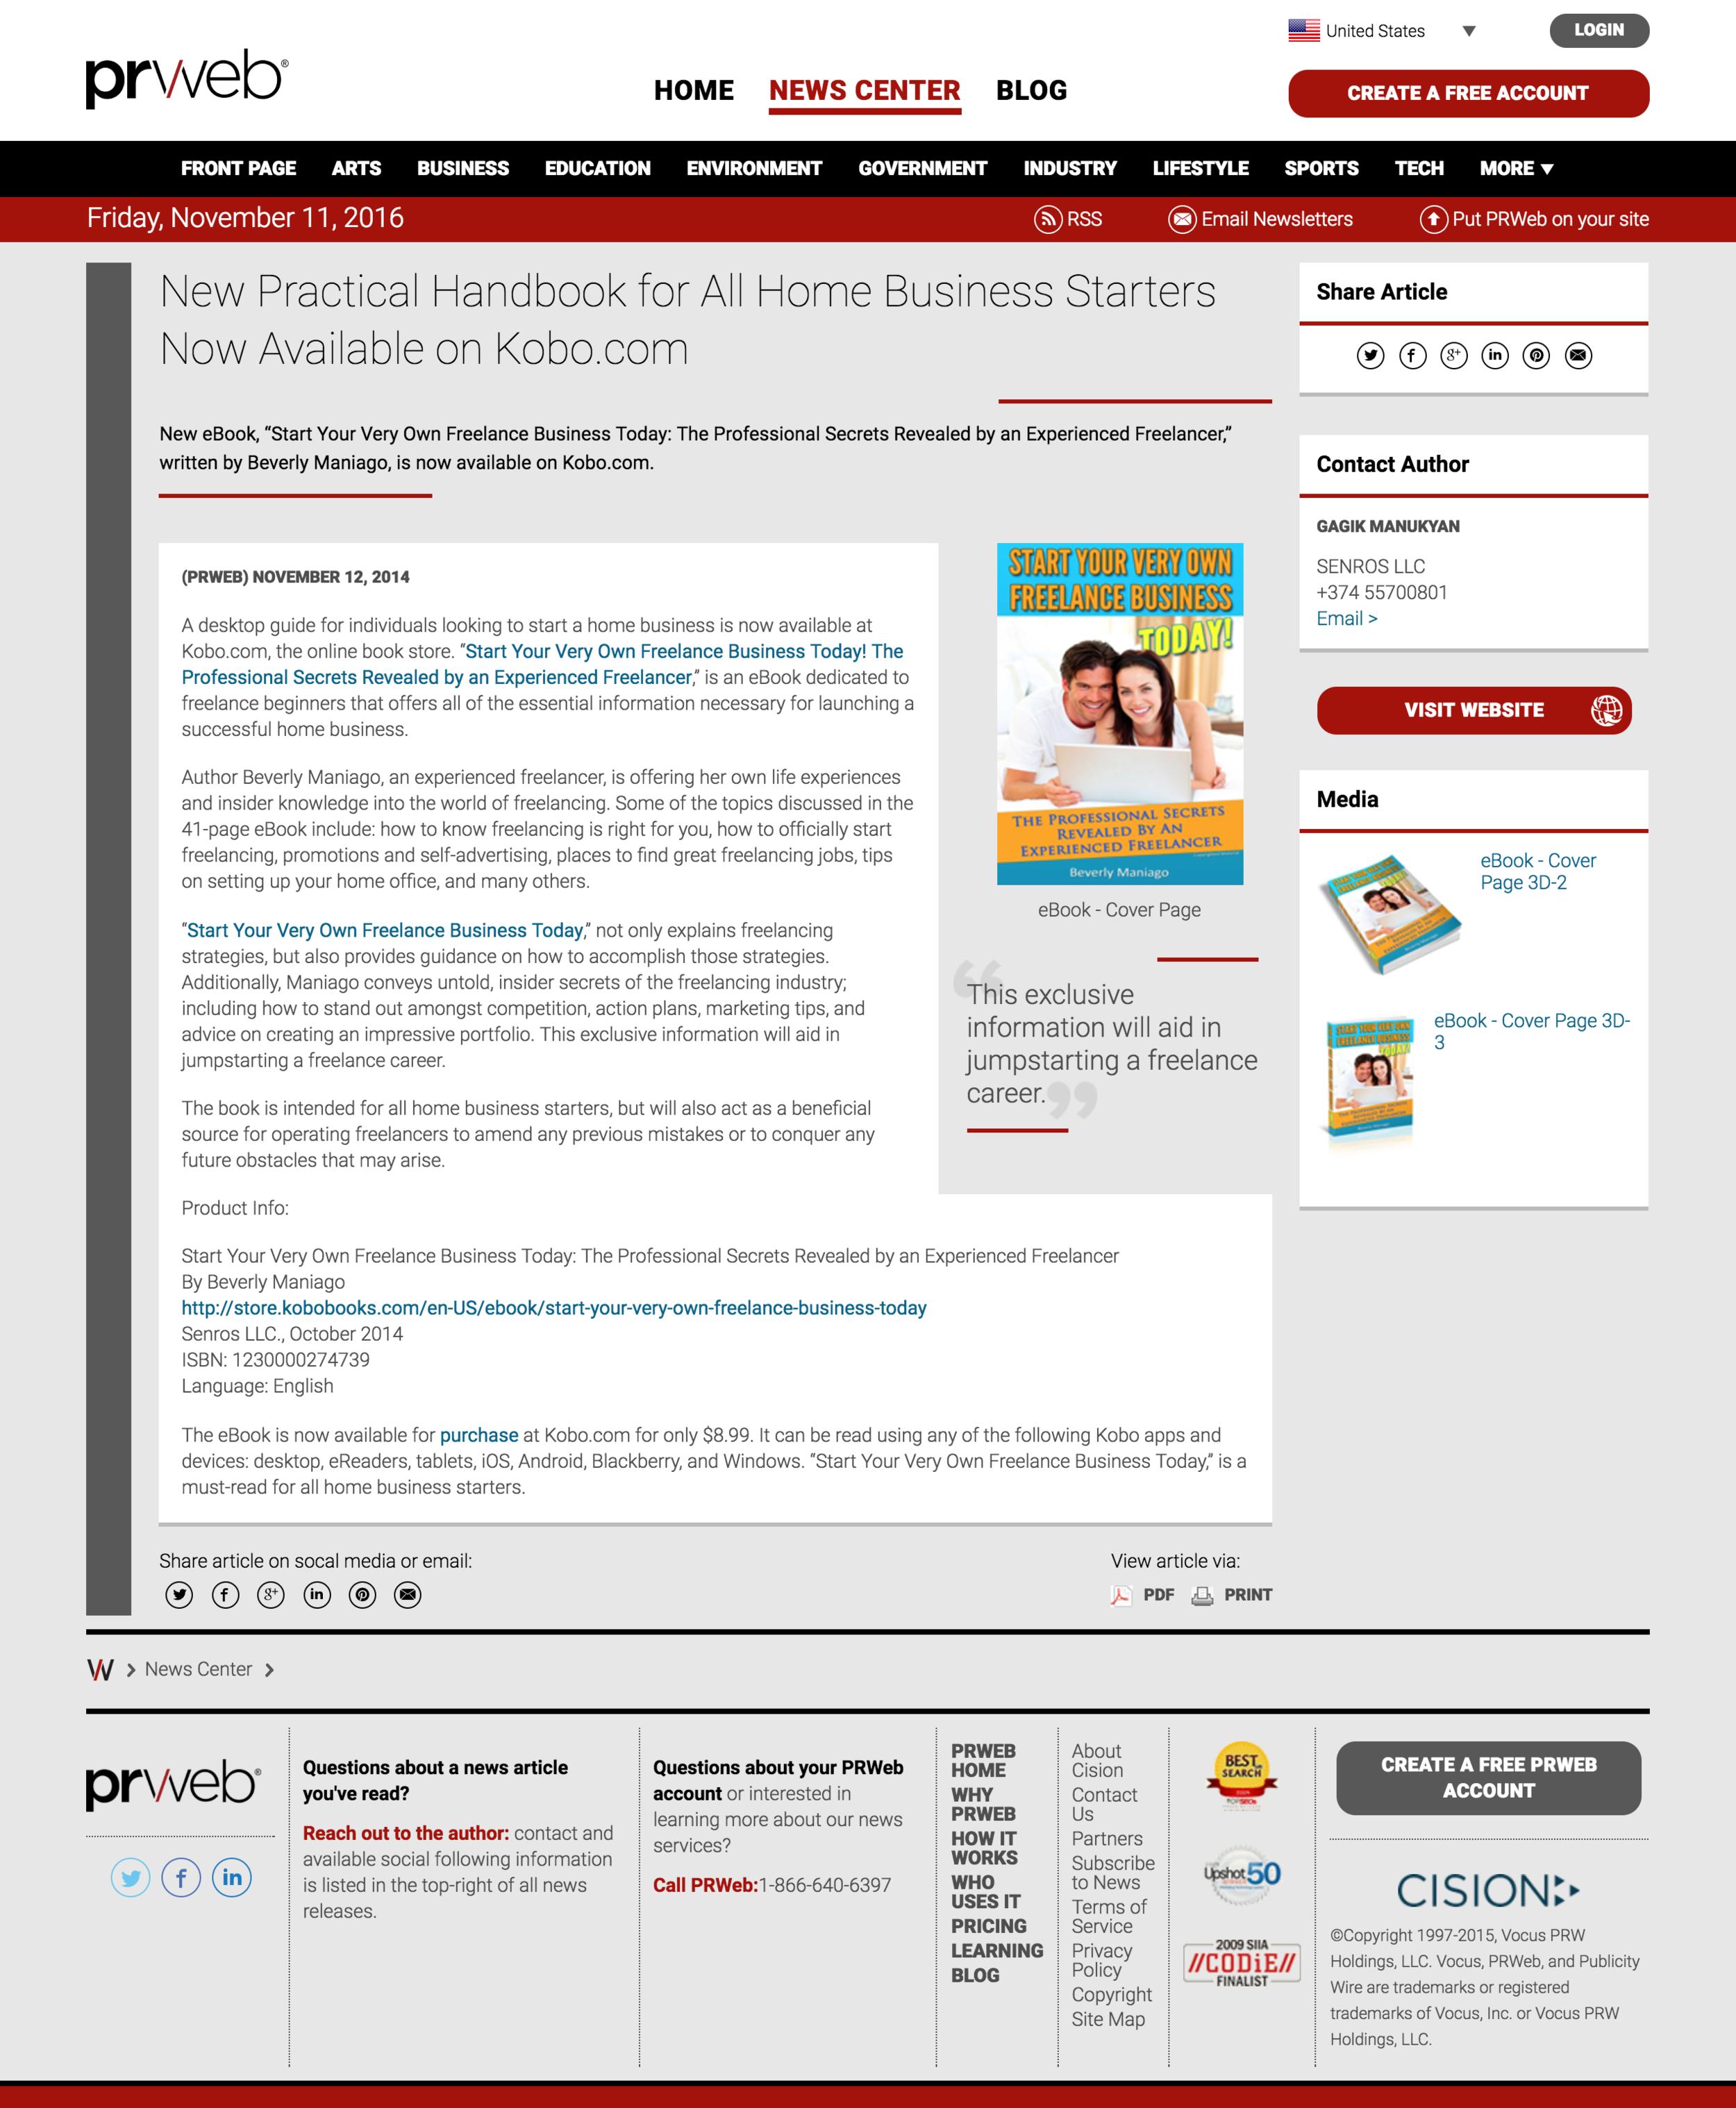 screencapture-prweb-releases-2014-11-prweb12310965-htm-1478889542376.png